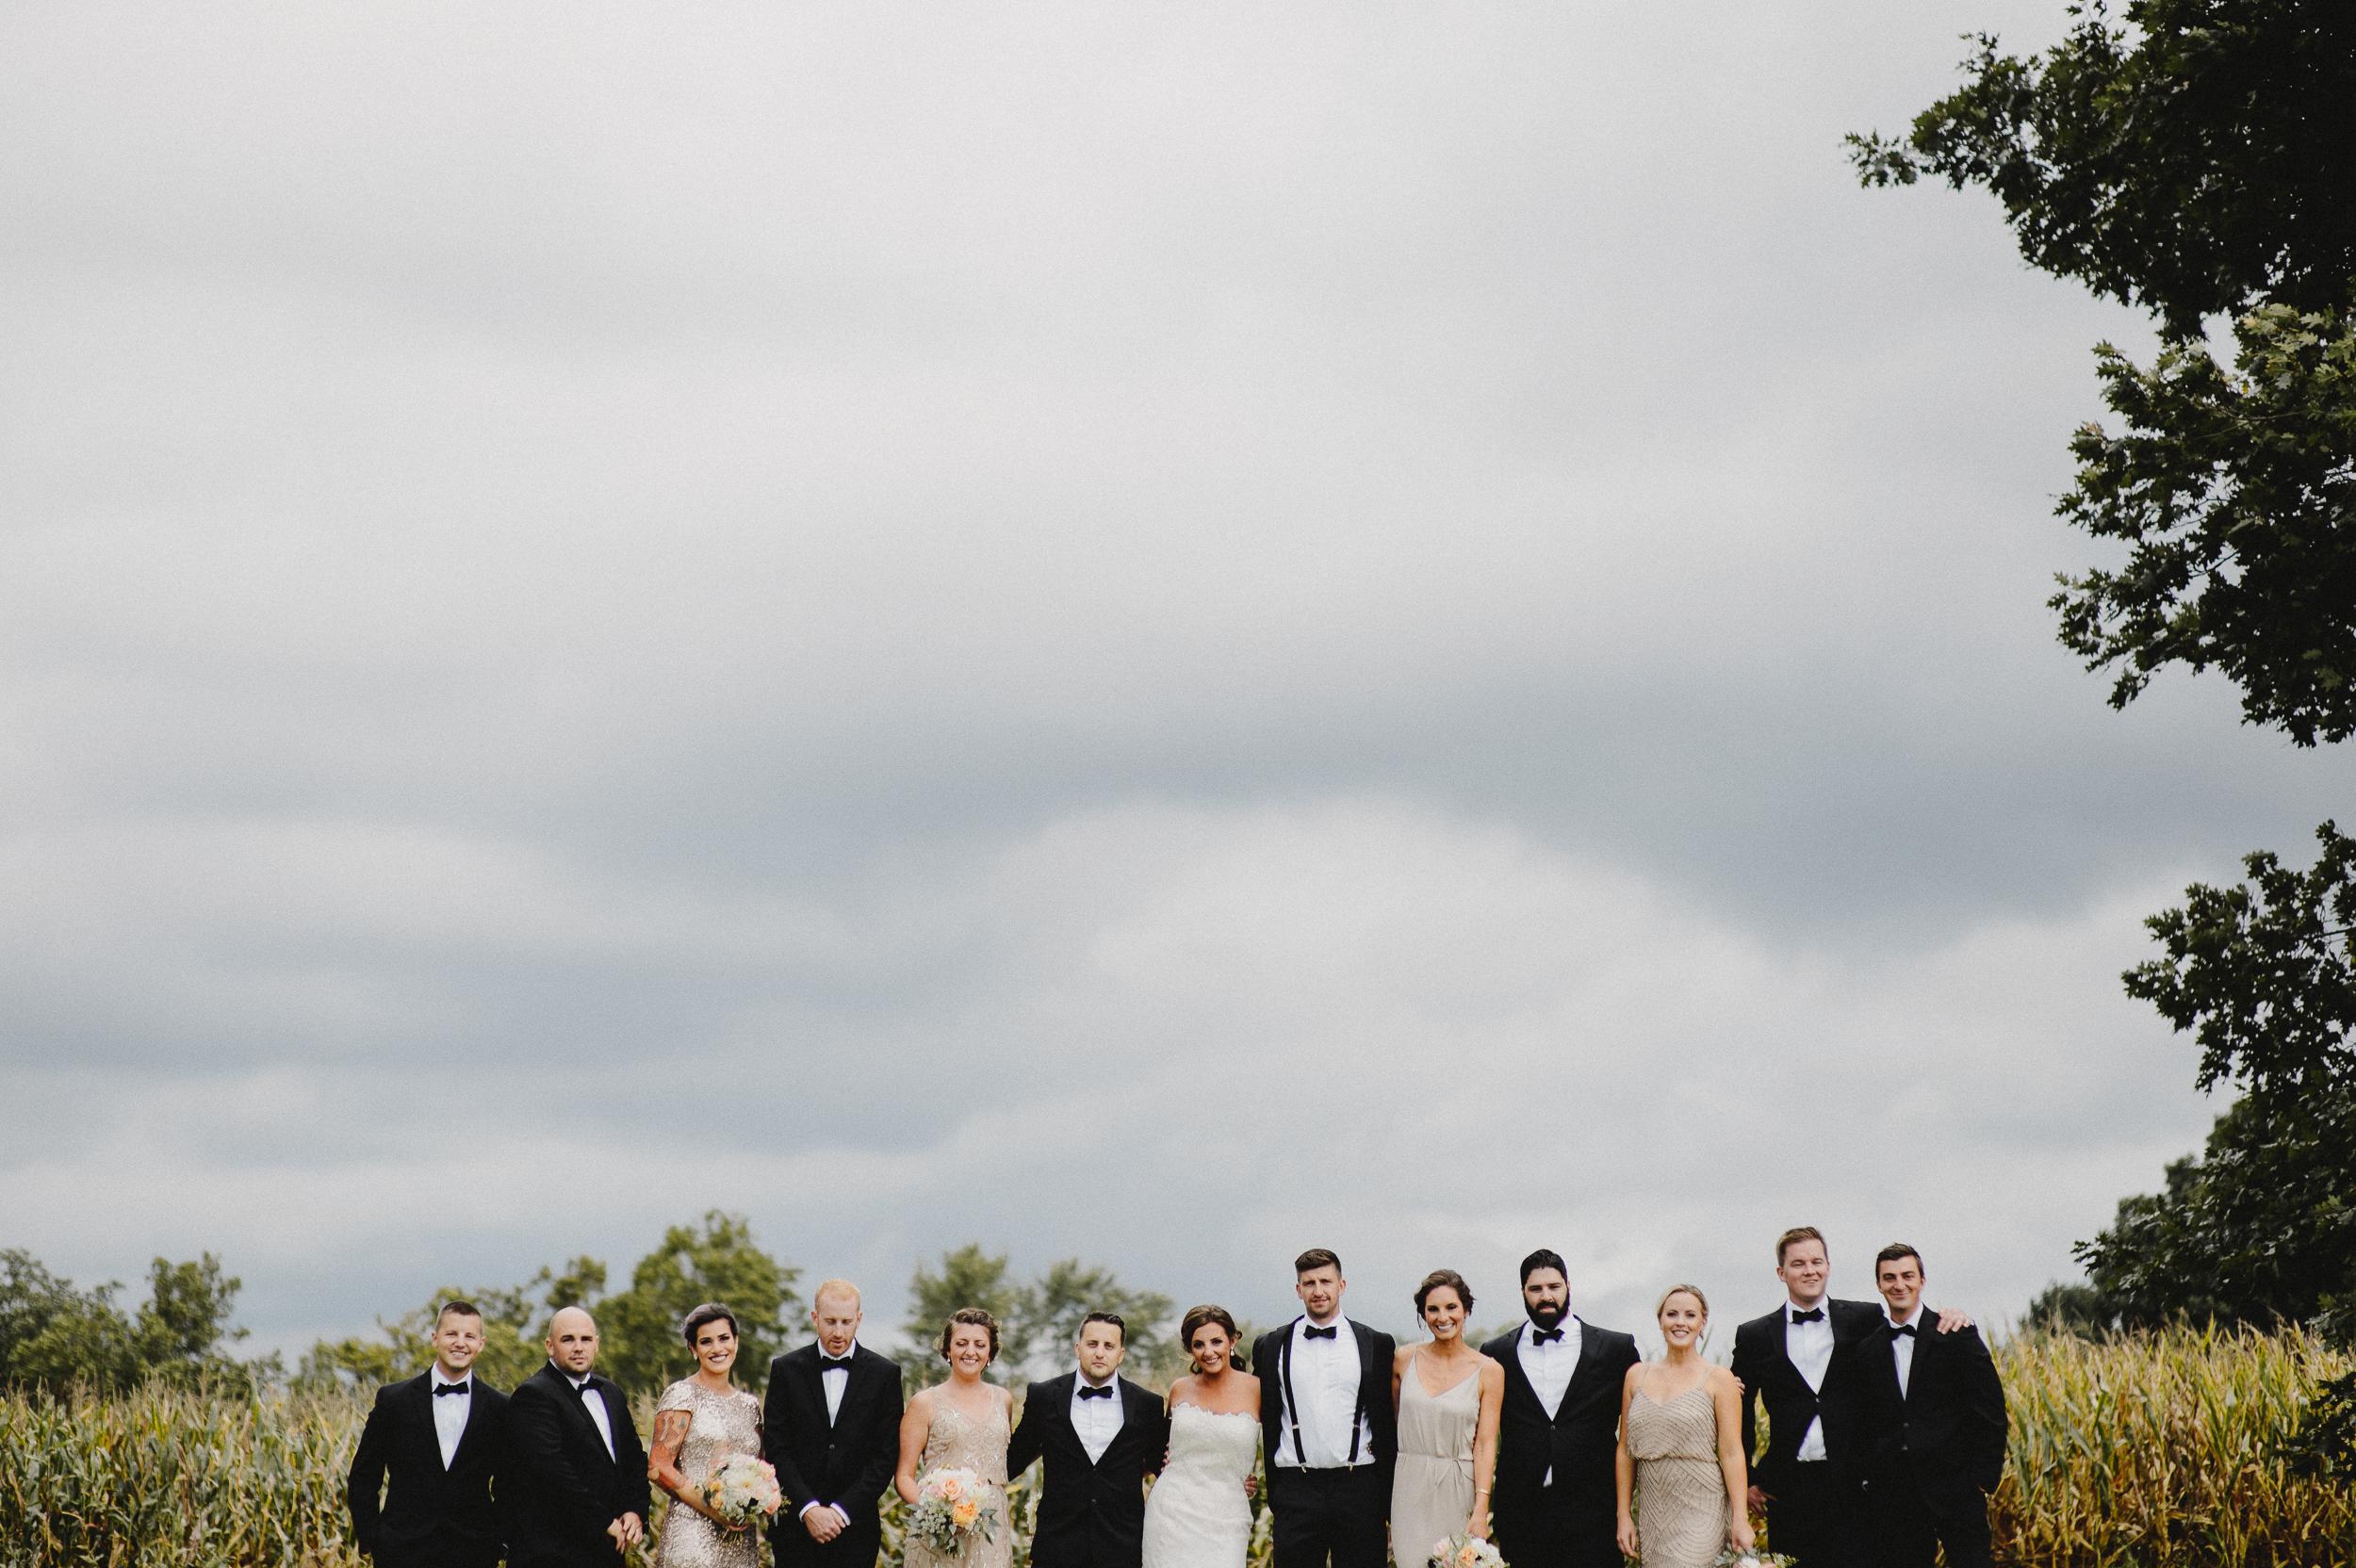 delaware-estate-wedding-photographer-pat-robinson-photography-58.jpg